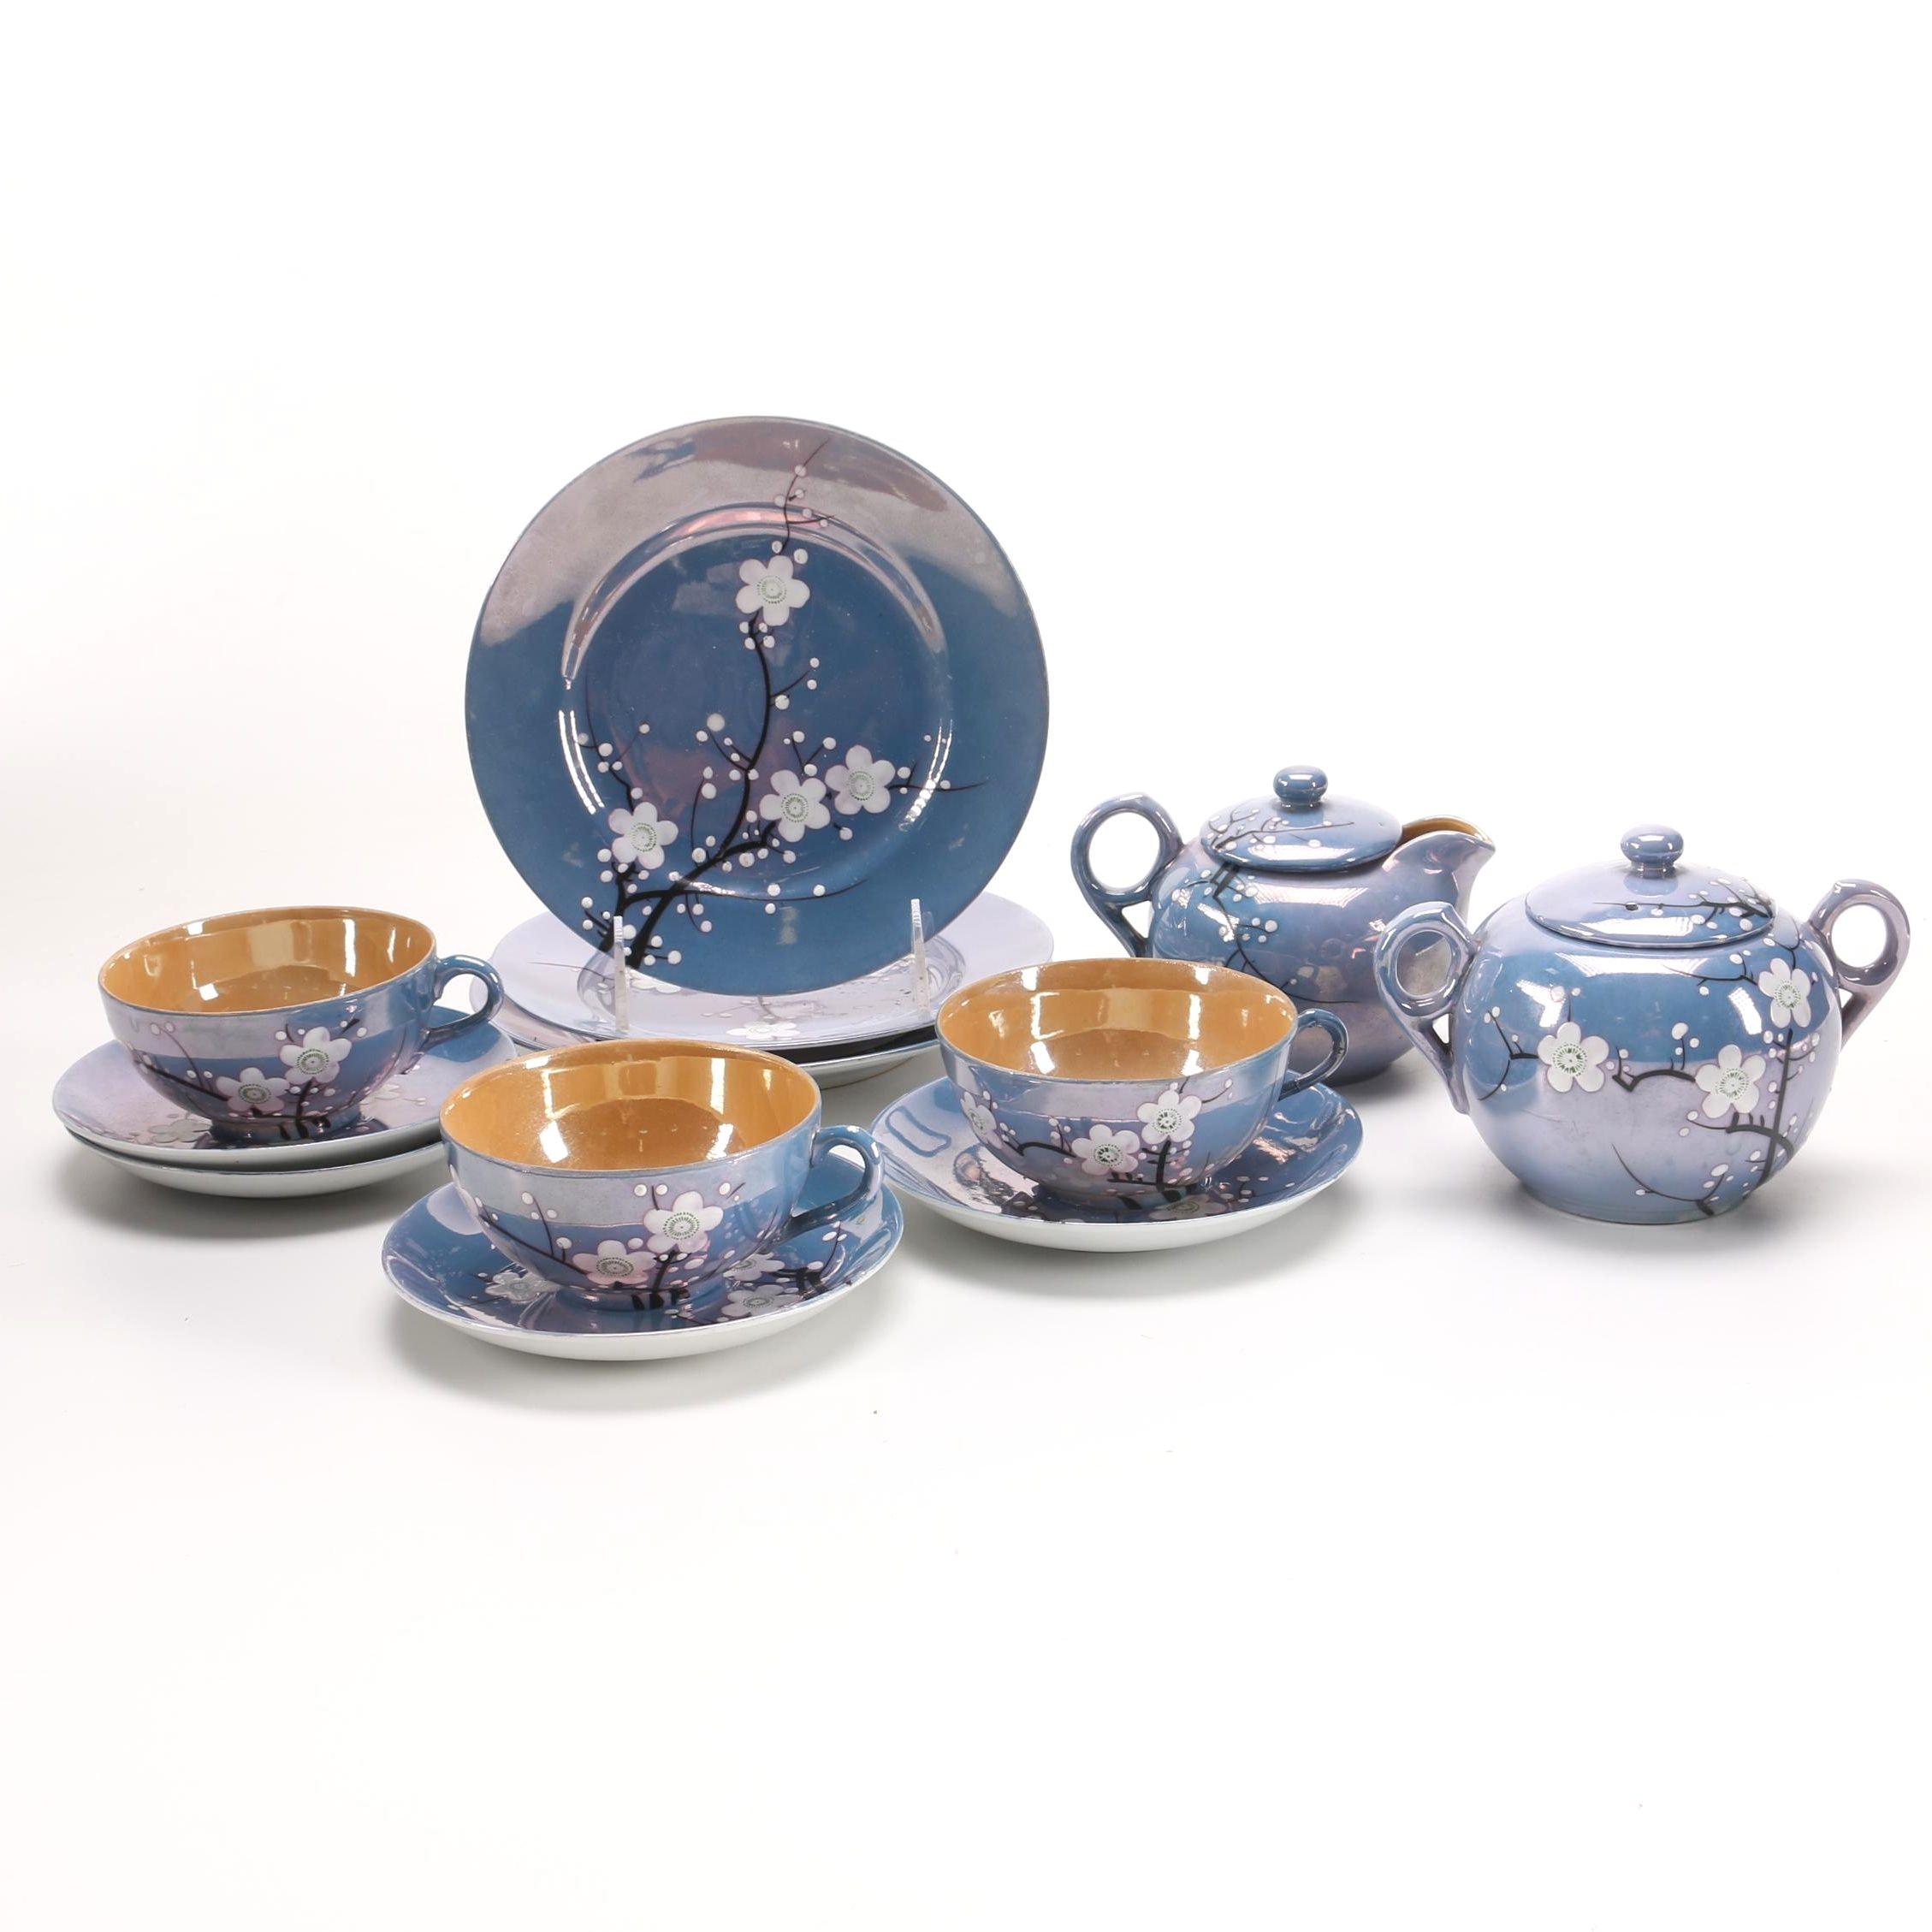 RS Japan Hand-Painted Lusterware Tea Set